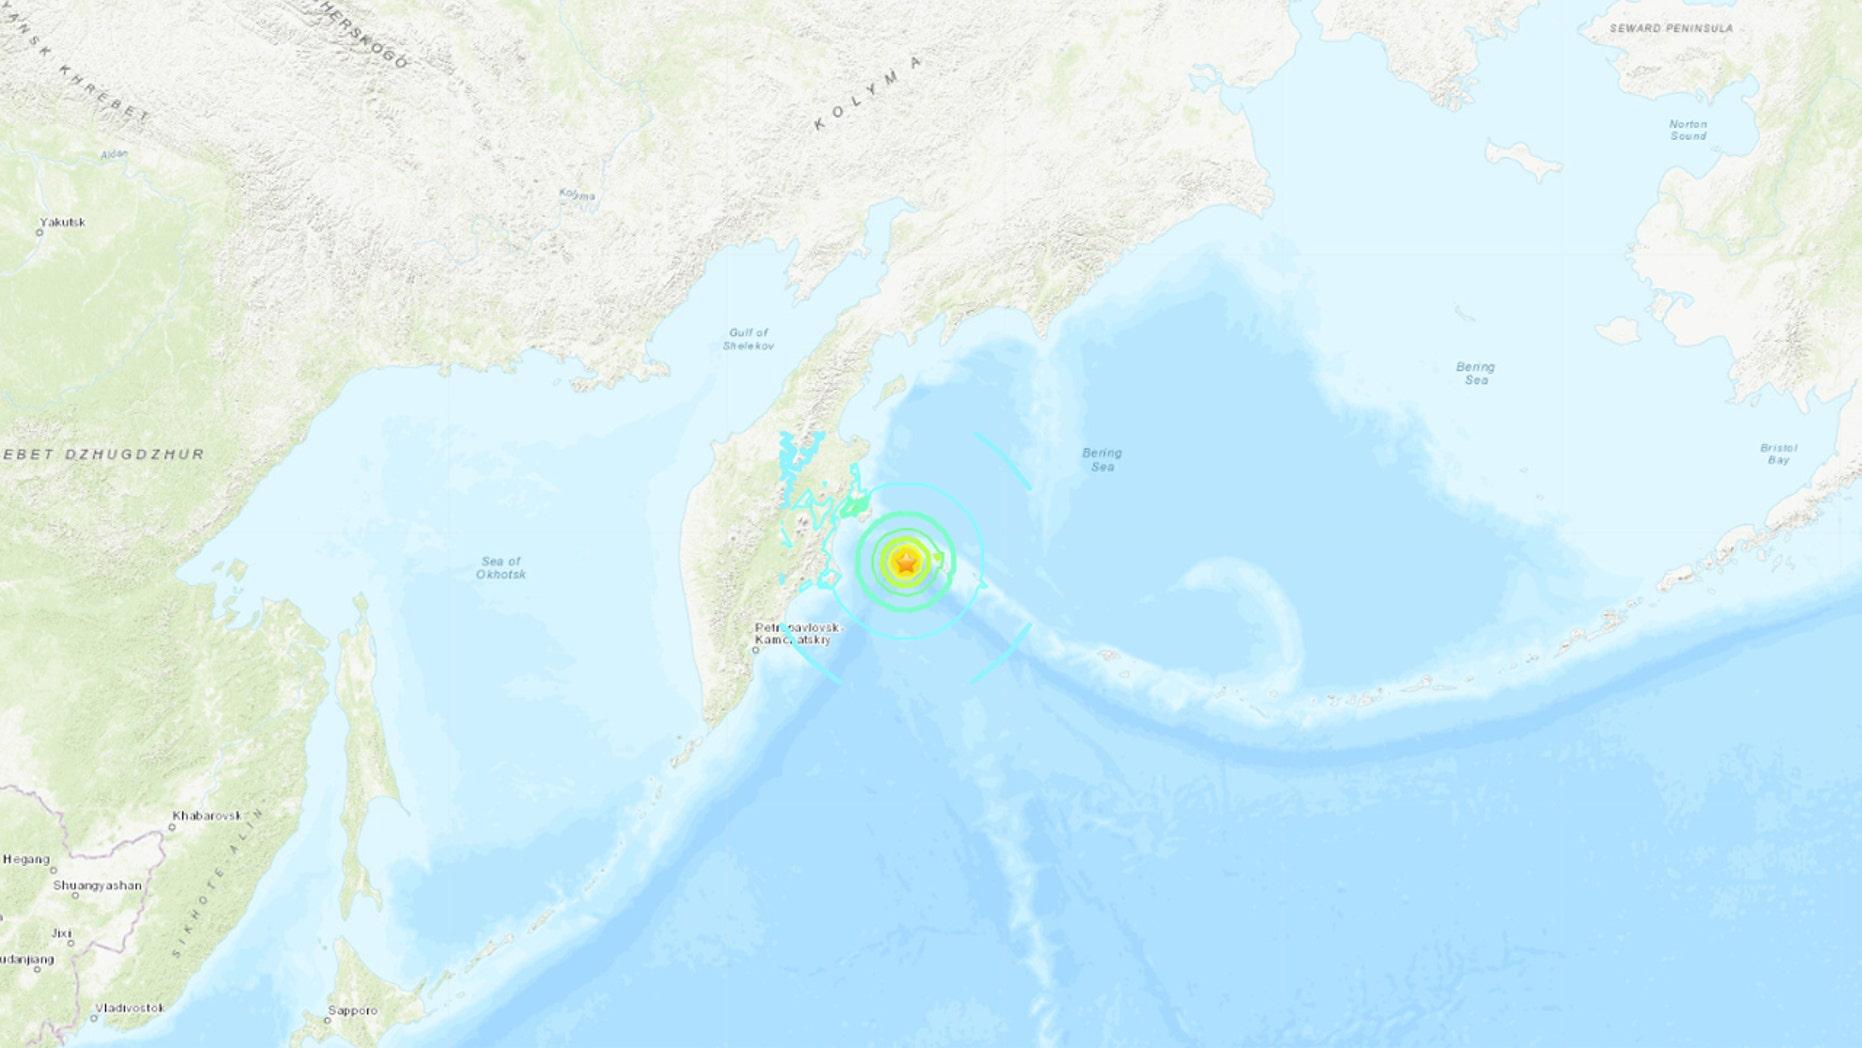 Magnitude 7.4 earthquake strikes off eastern coast of Russia ... on russia japan map, russia flood map, russia pollution map, russia weather map, russia volcano map, russia environment map, russia 1941 map, russia airport map, russia wildfires map, russia meteor map,